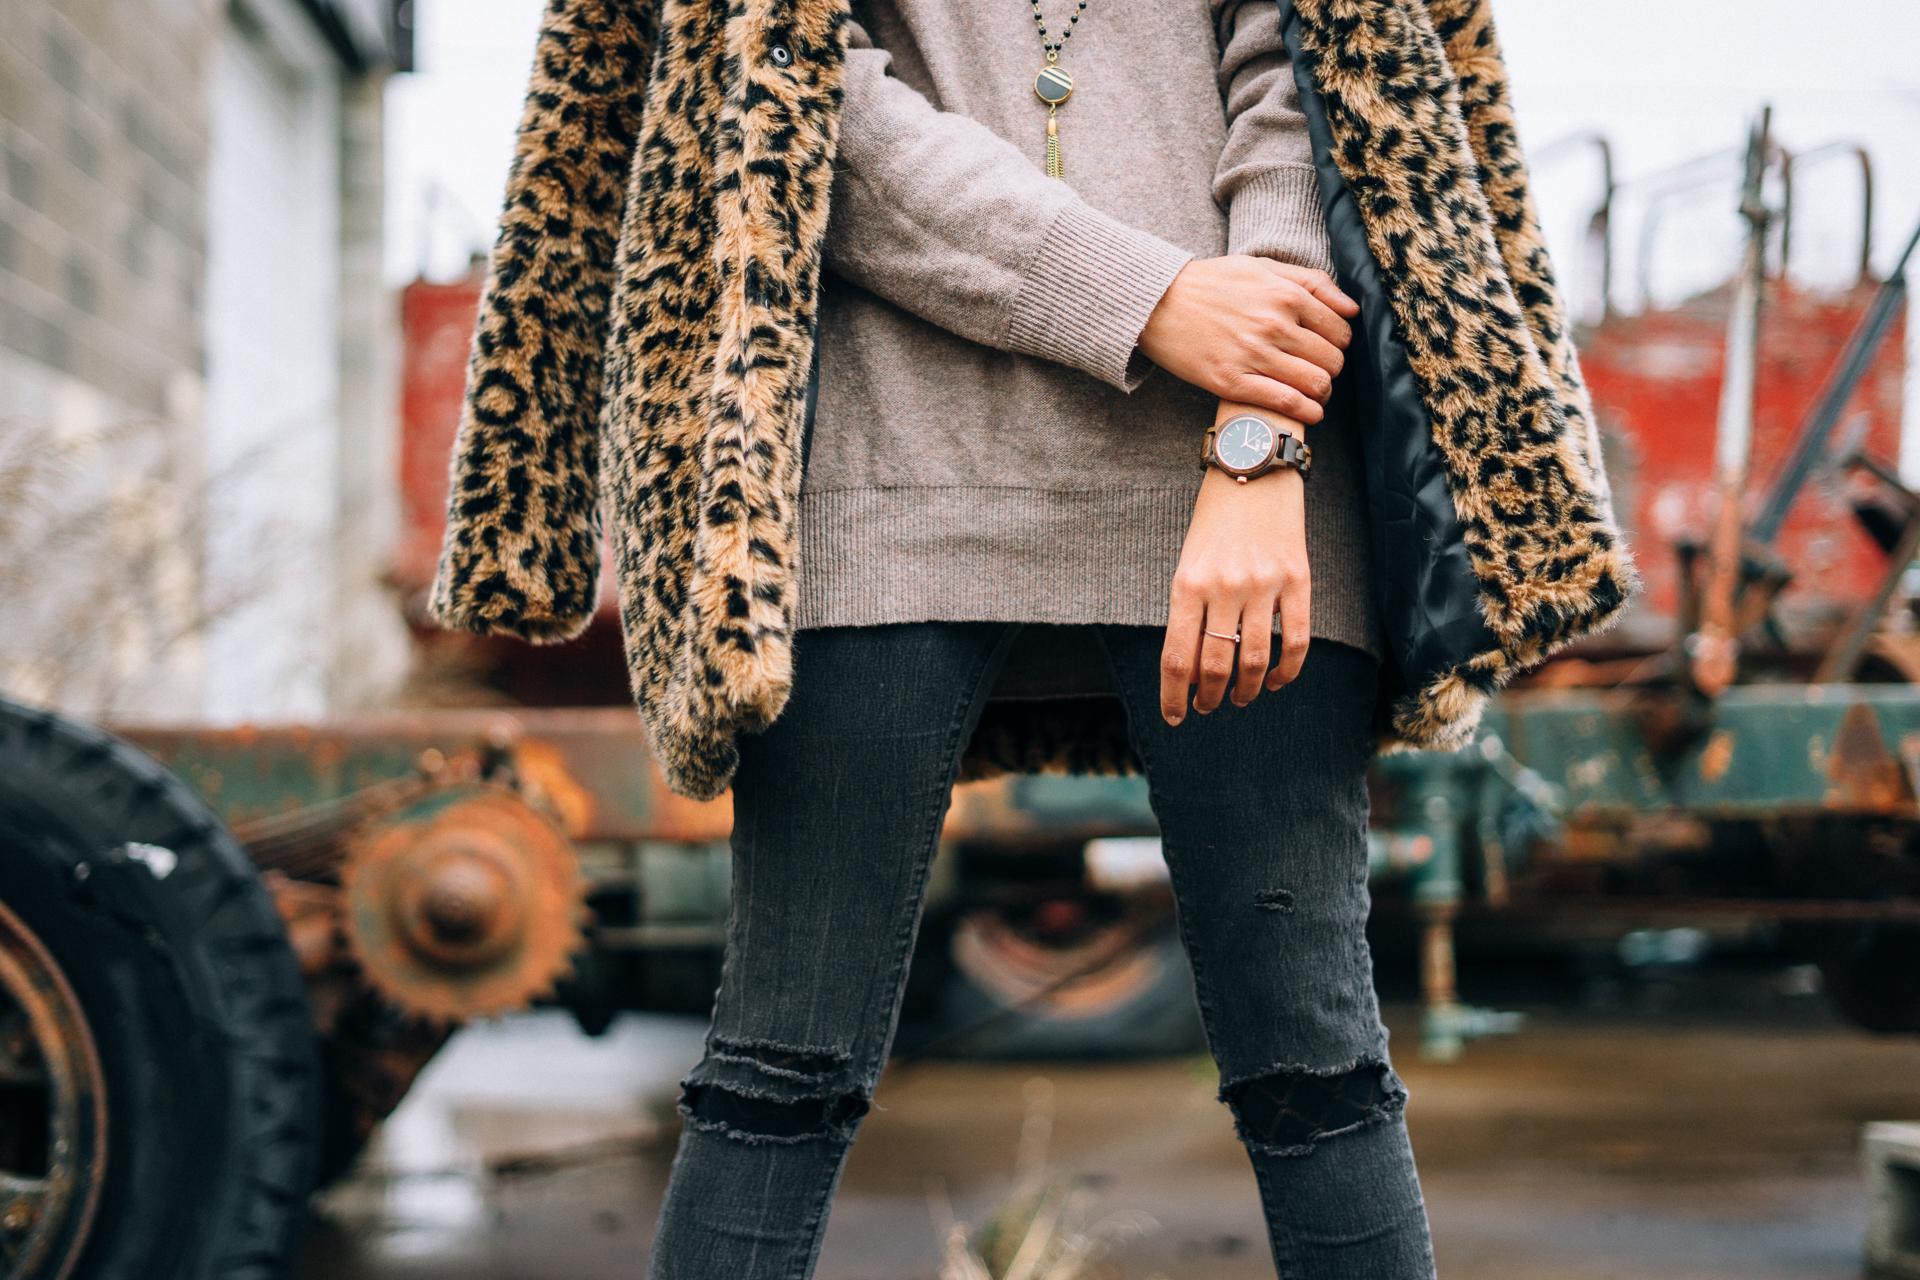 leopard-faux-fur-coat-velvet-boots-winter-style-blogger-outfit-street-fashion 5